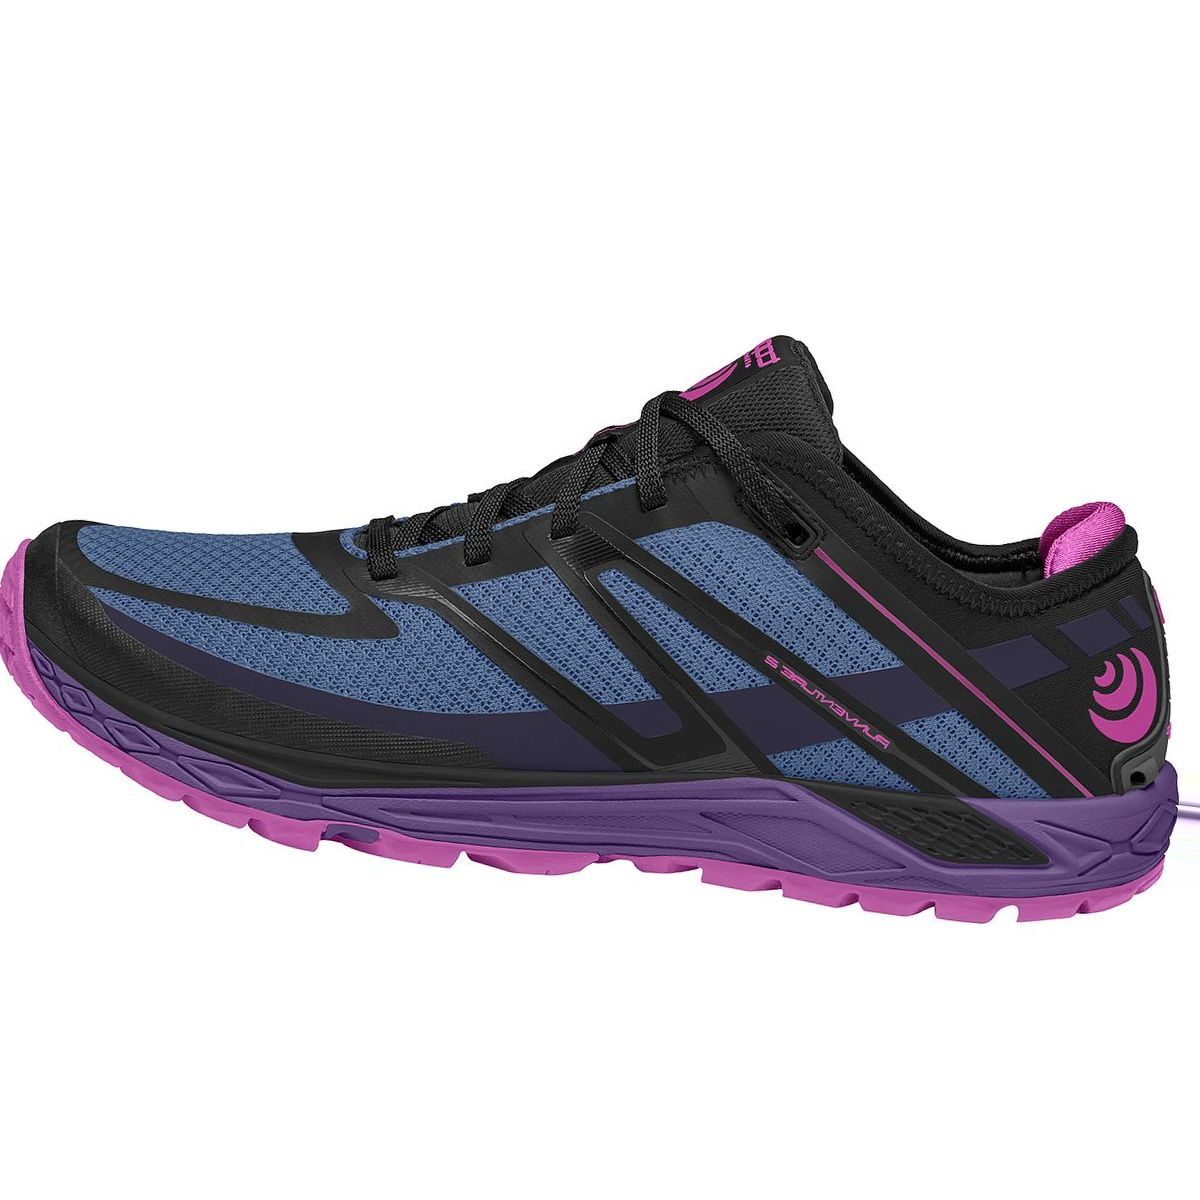 Topo Athletic Runventure 2 Trail Running Shoe - Women's